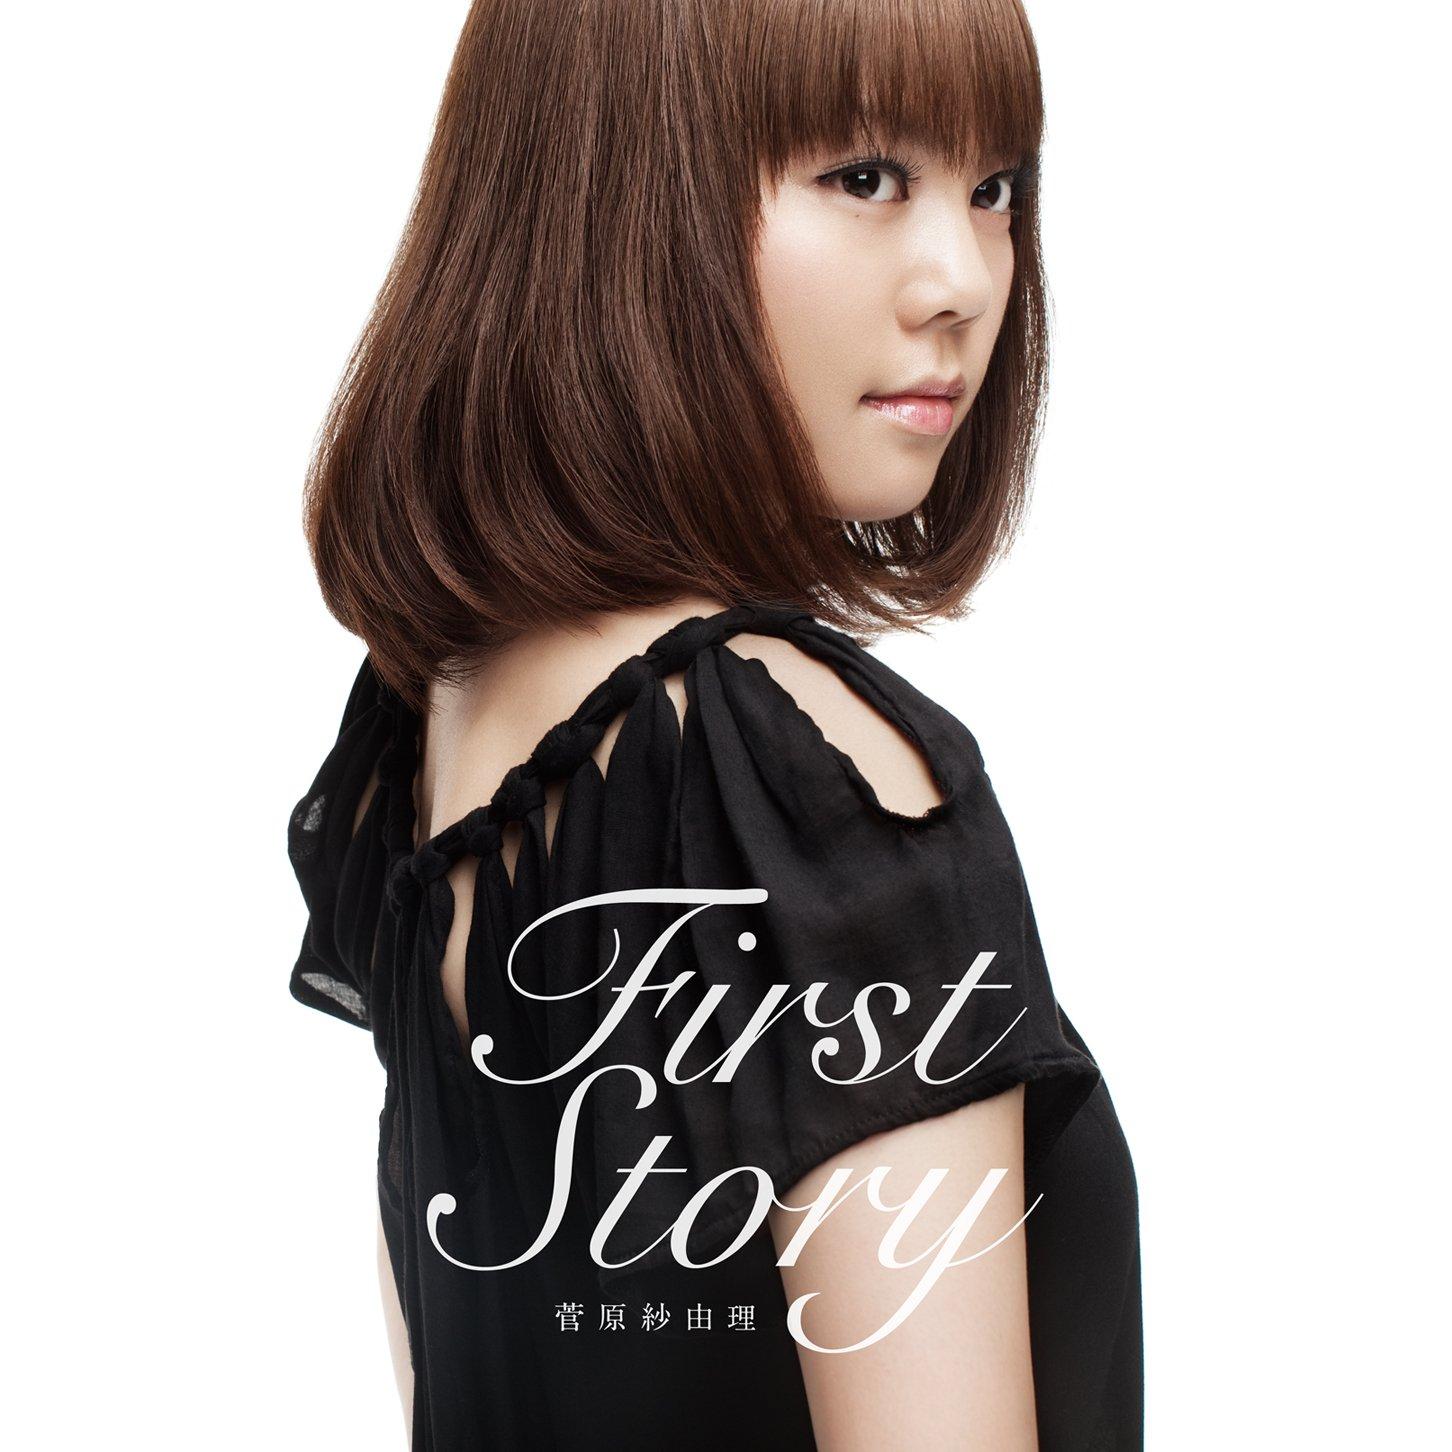 20161018.22.16 Sayuri Sugawara - First Story cover 1.jpg